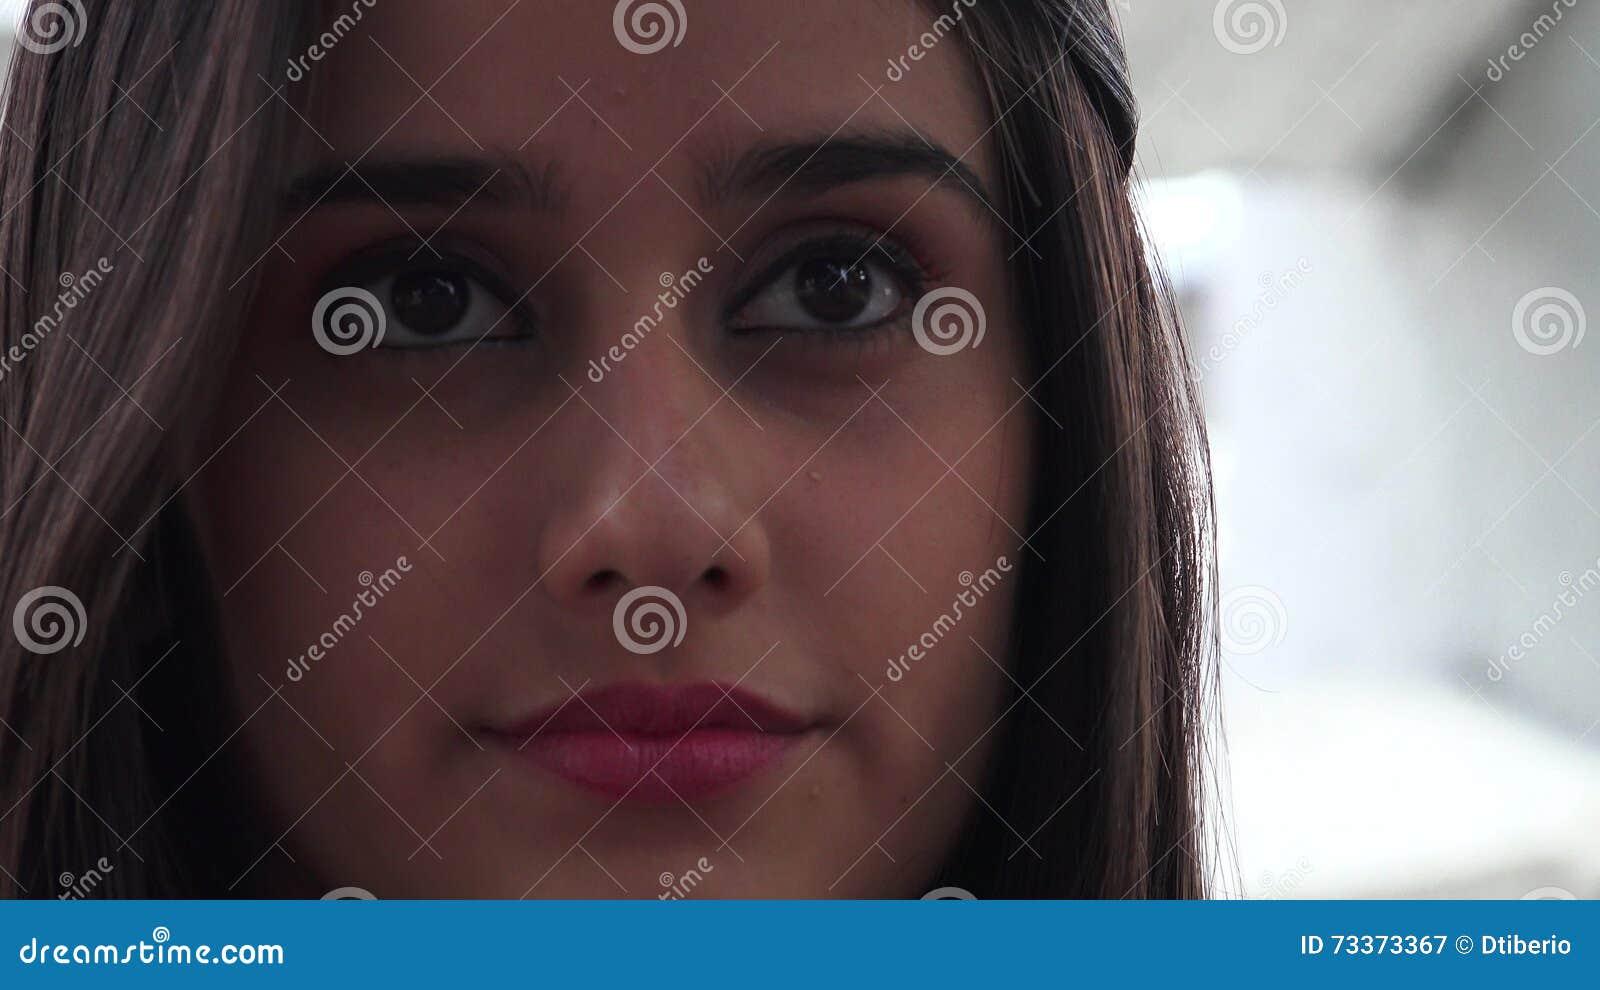 Cum face loaded